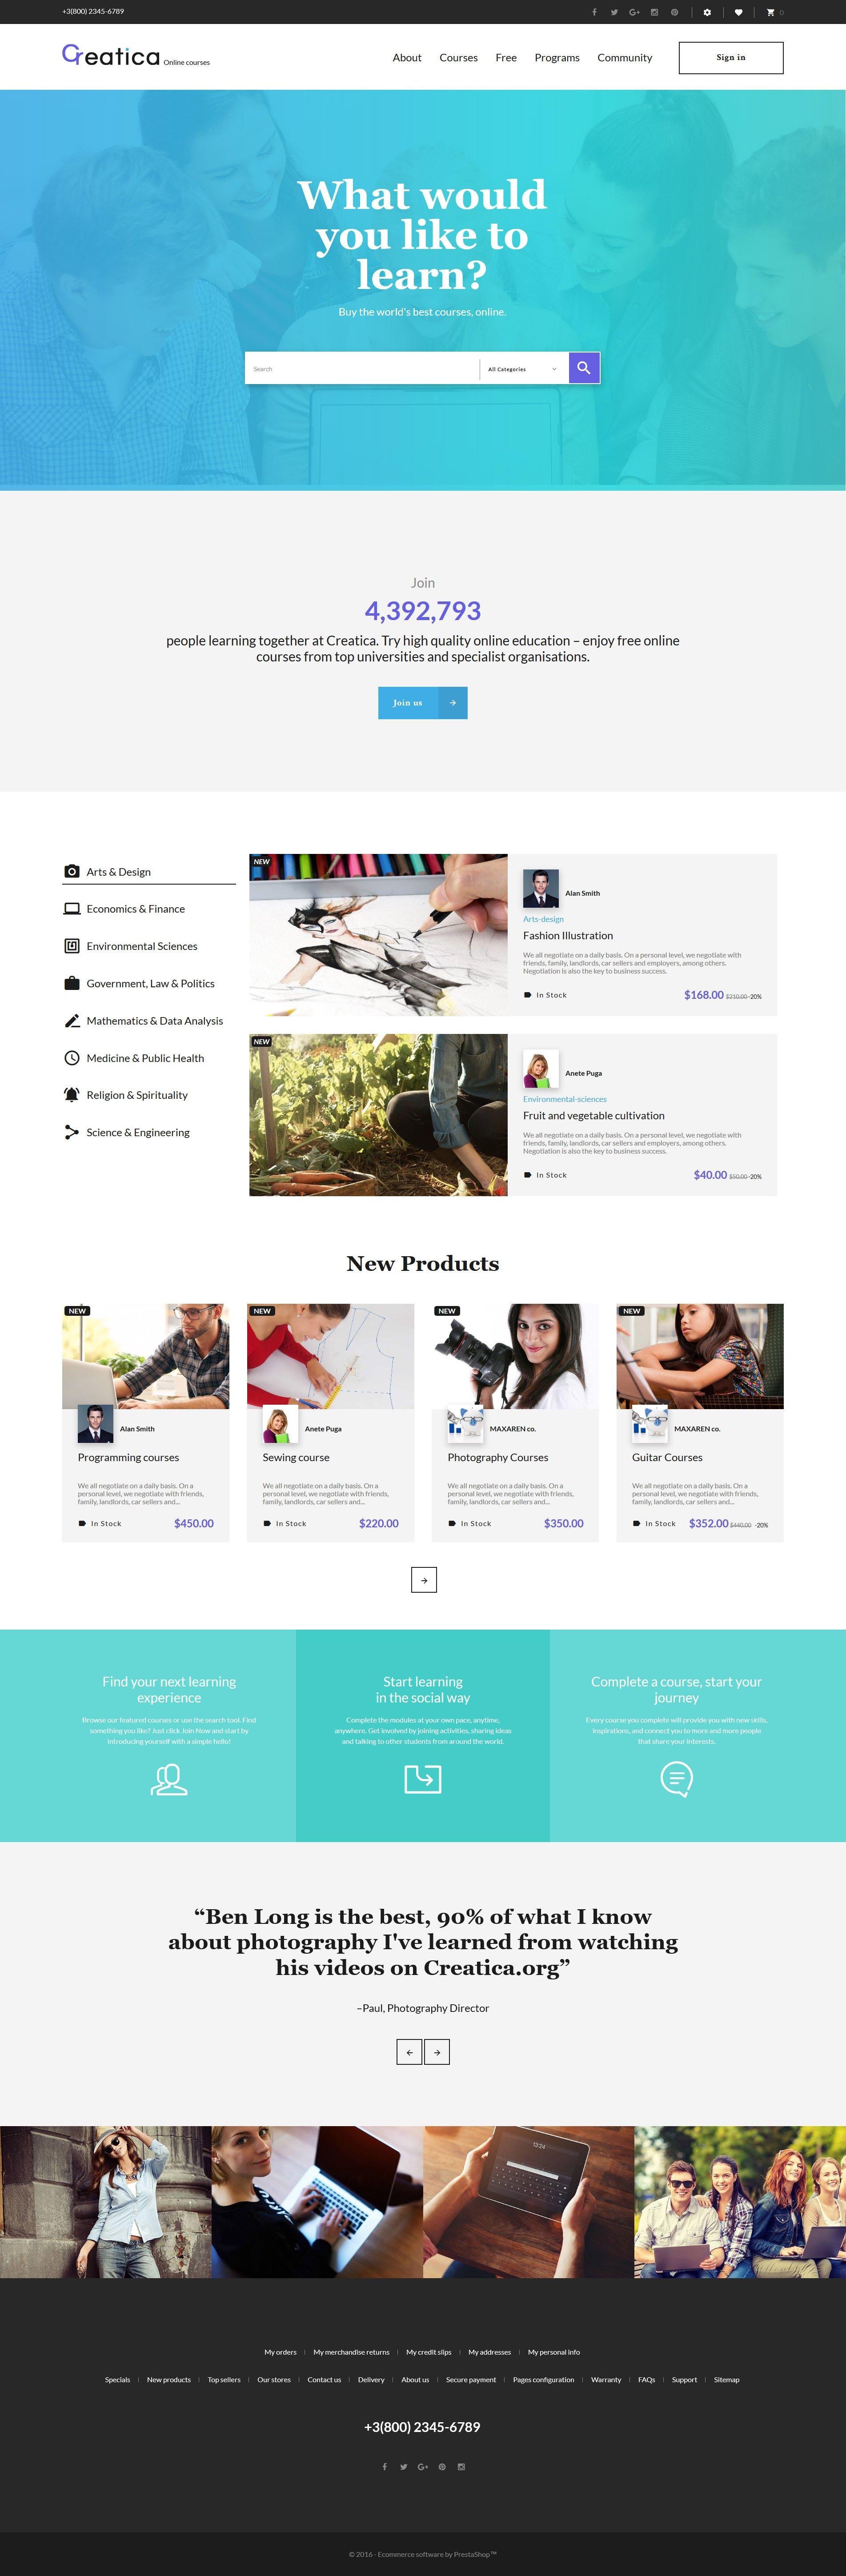 Creatica - Online Courses PrestaShop Theme - screenshot